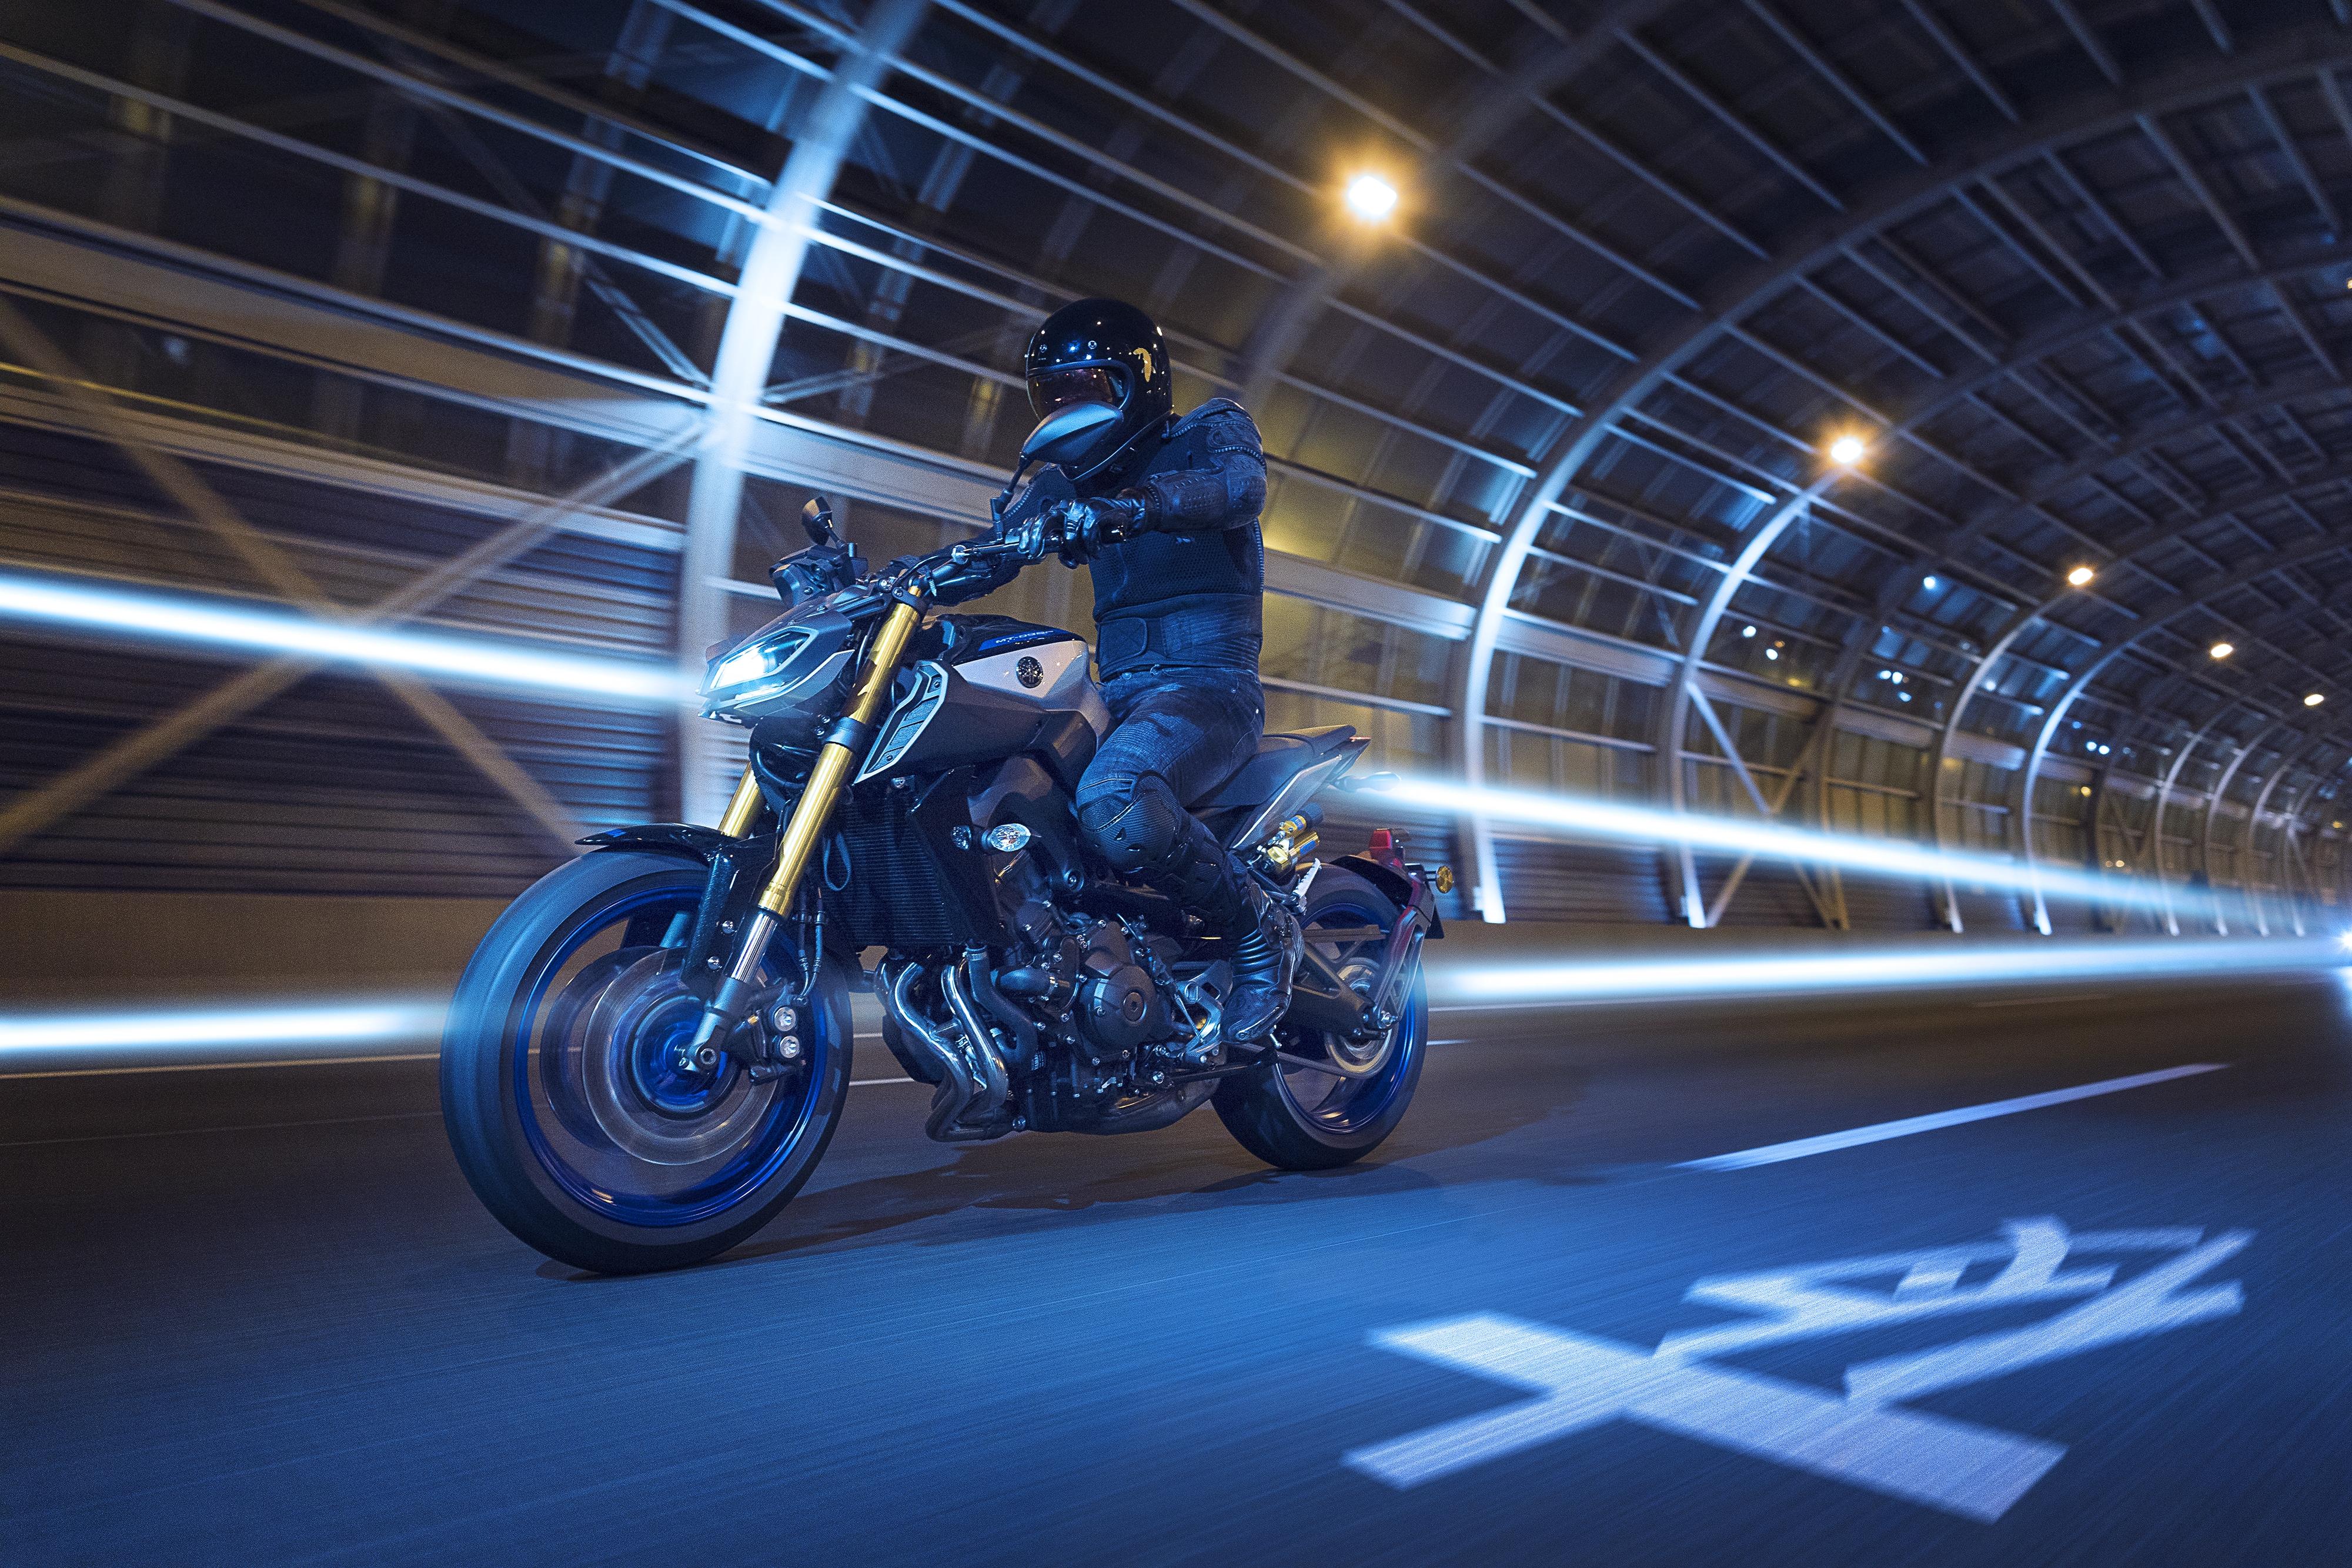 Yamaha MT-09 SP ABS | MotorCentrumWest